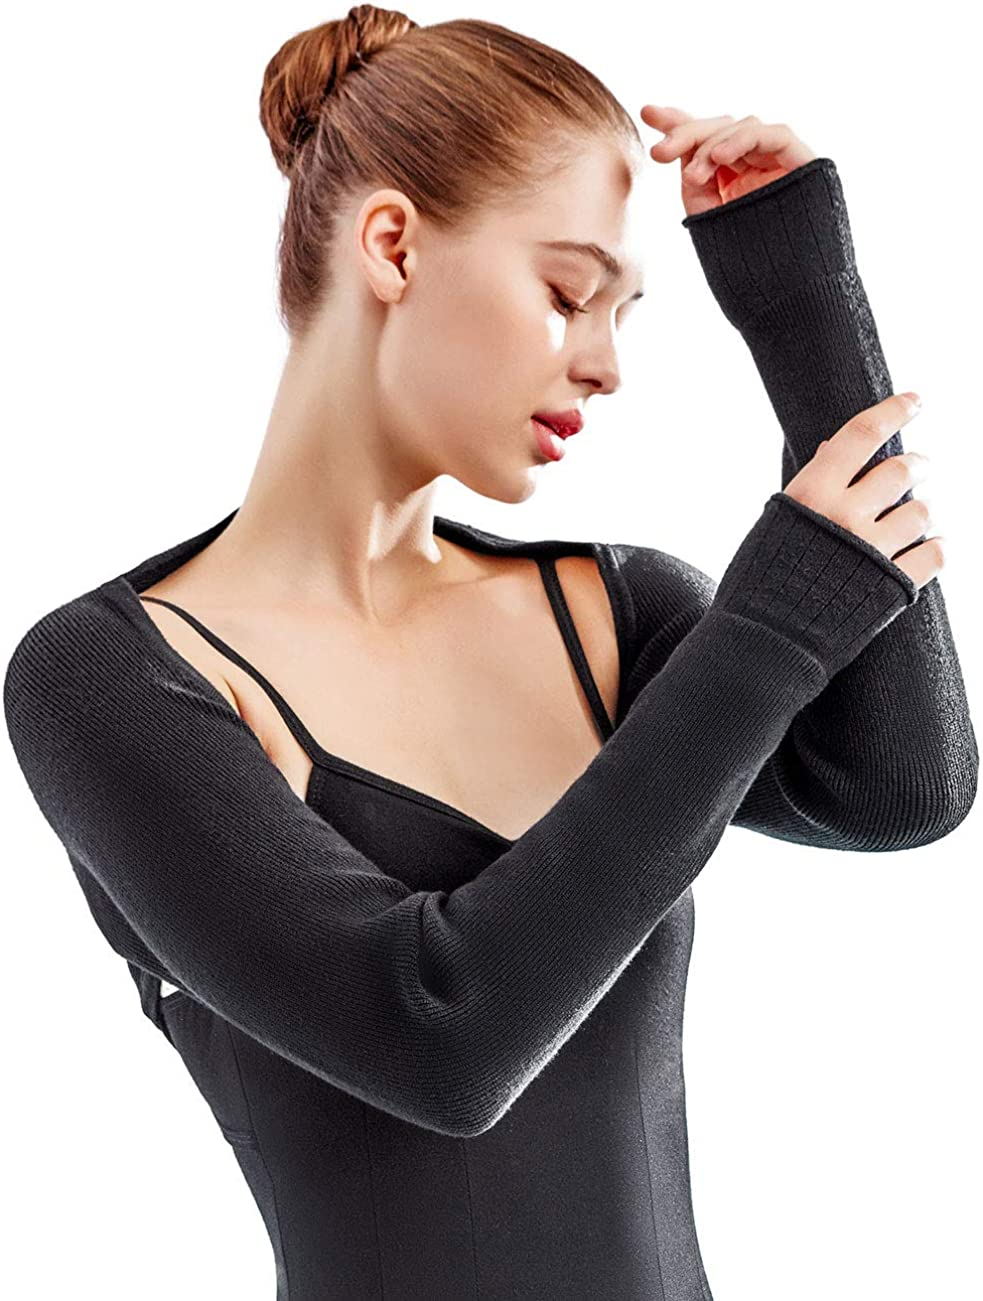 Petite Women Dance Shrug Sweater Black Long Sleeve Open Front Ballet Cardigans